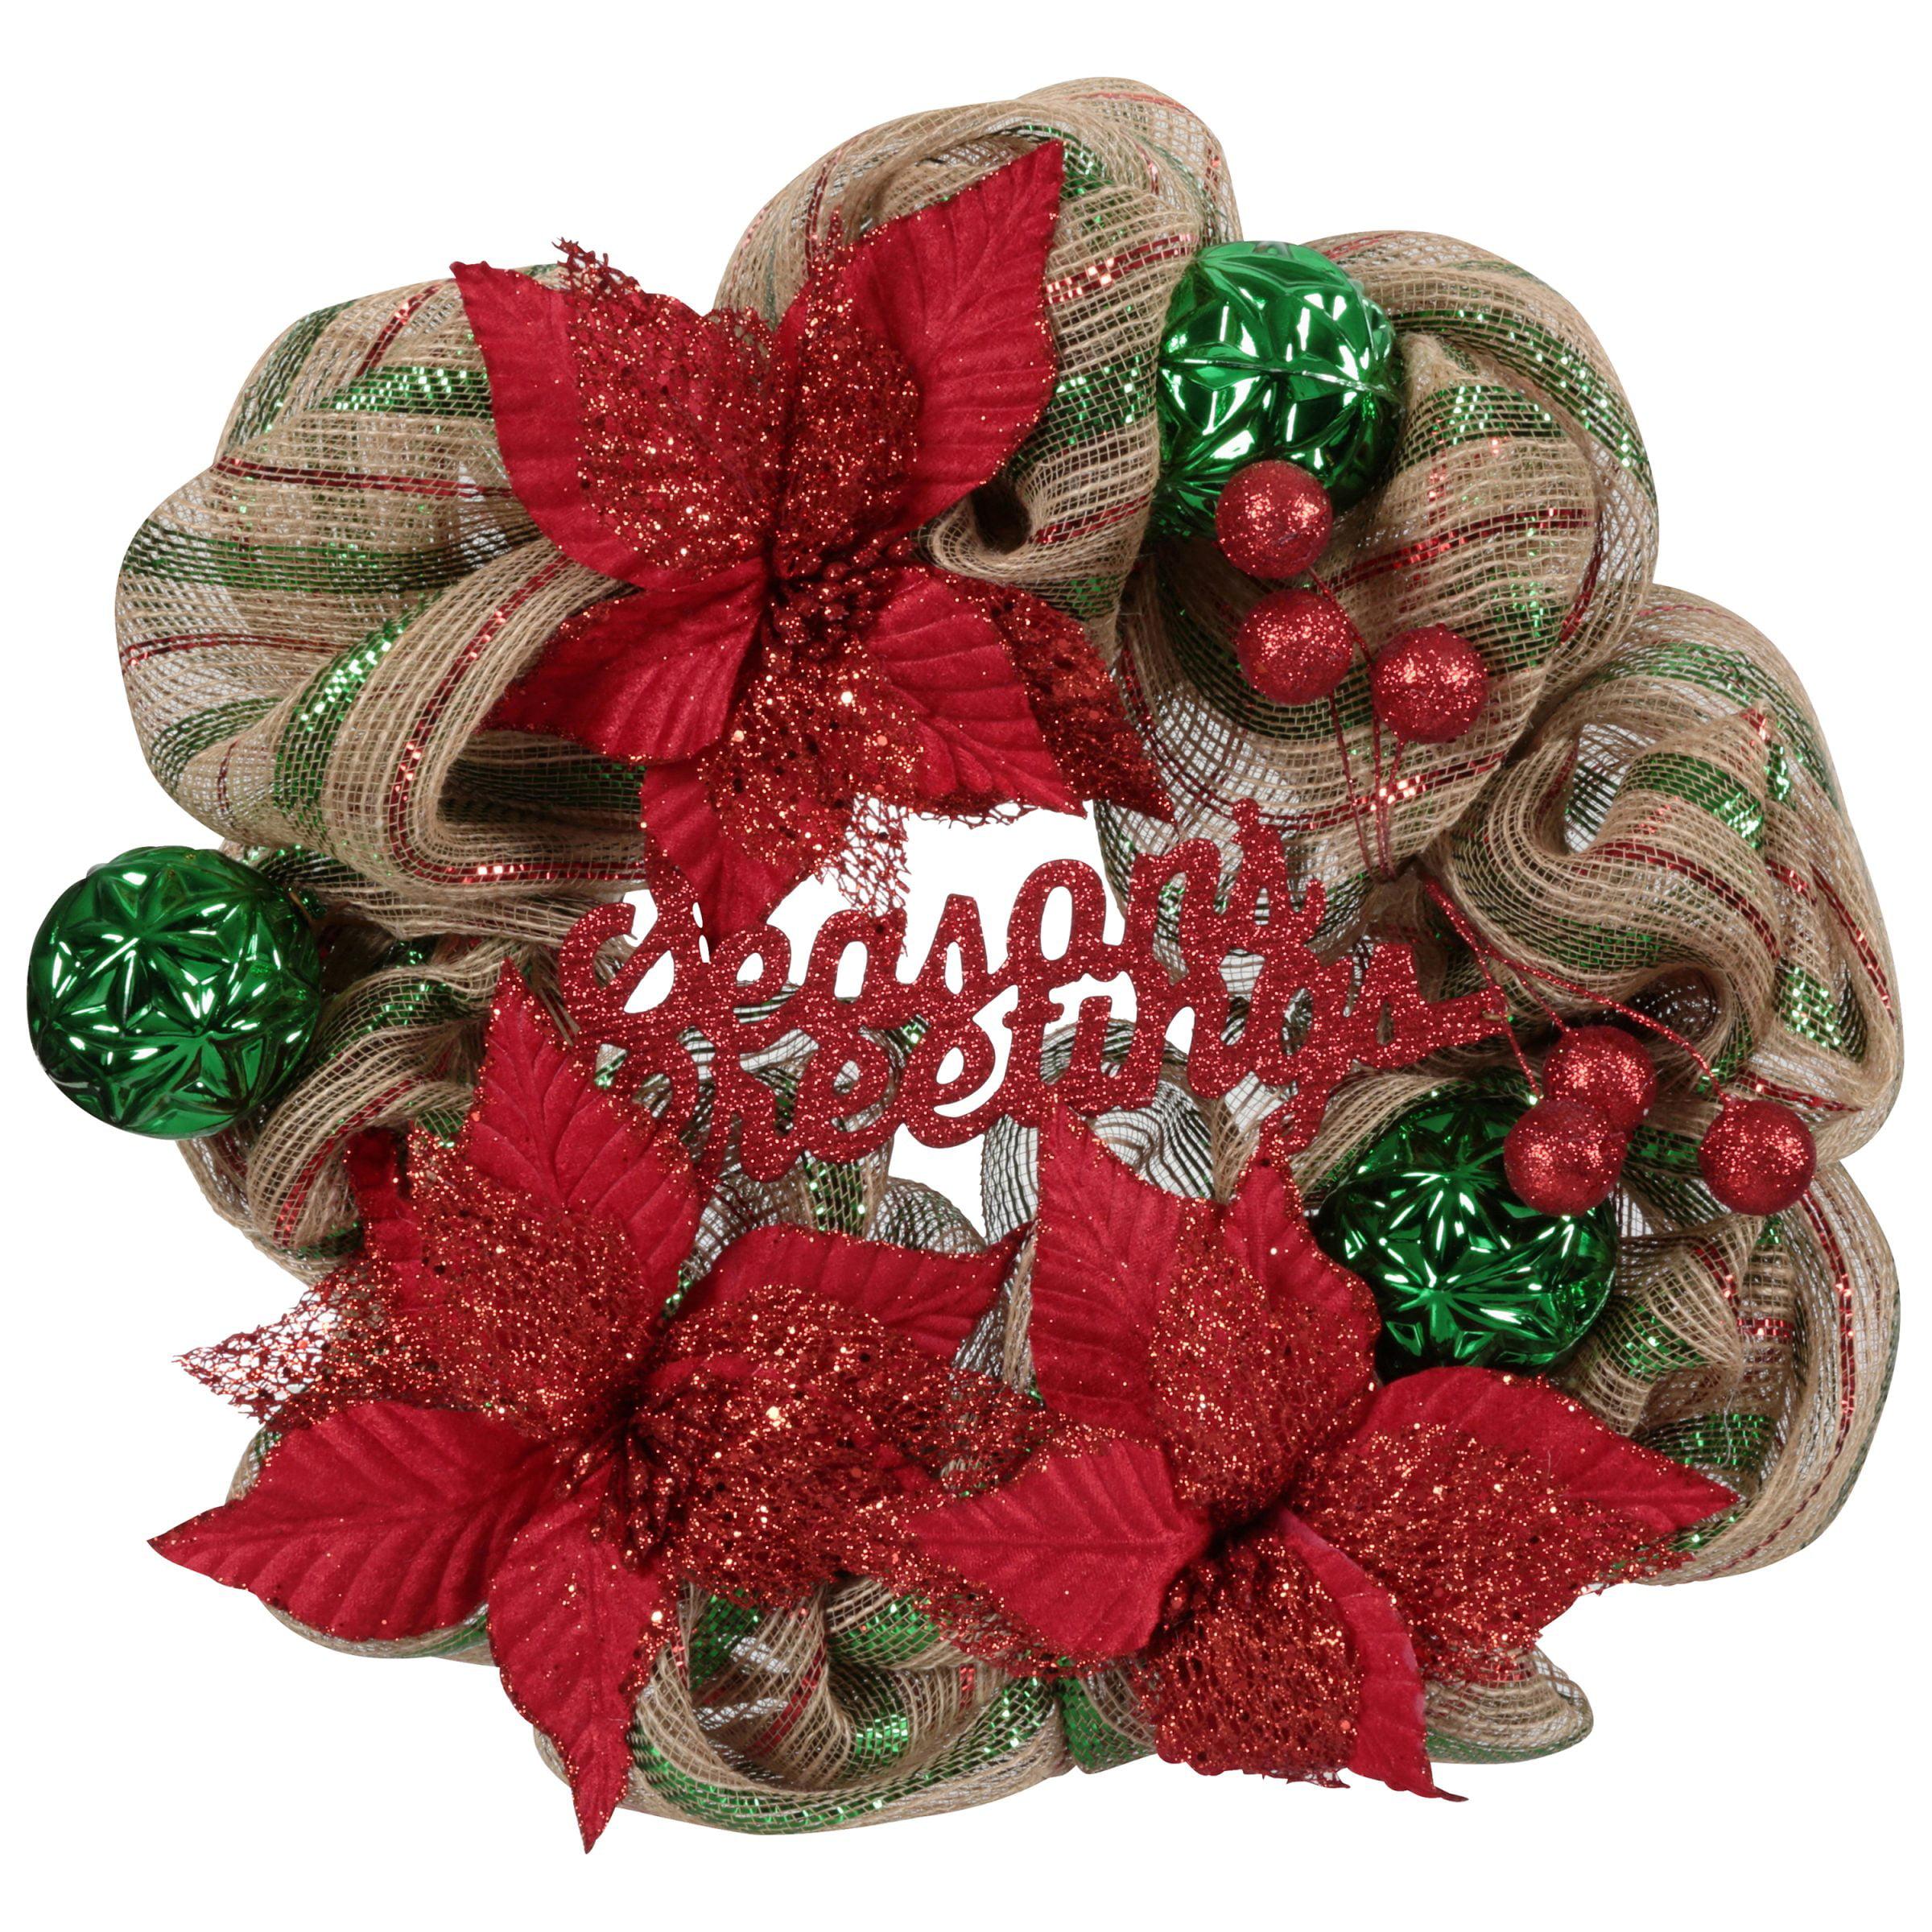 Wal-Mart Stores, Inc. Holiday Time Seasons Greetings 20-Inch Mesh Wreath